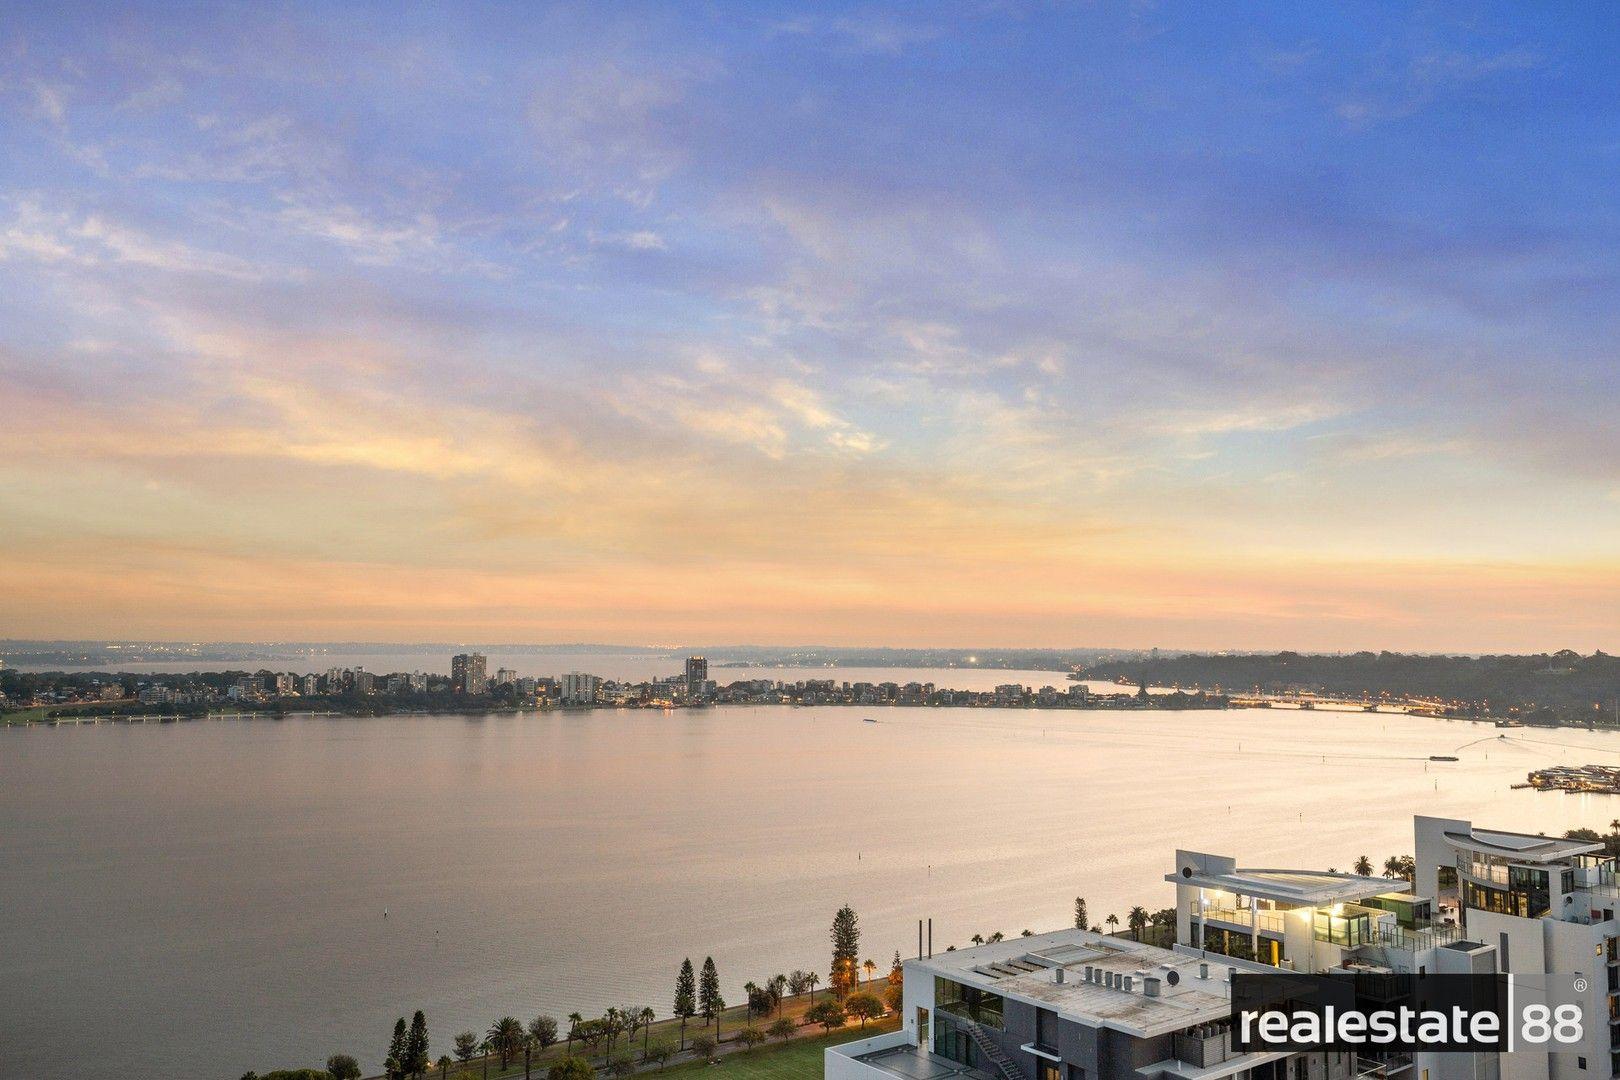 180/181 Adelaide Terrace, East Perth WA 6004, Image 0